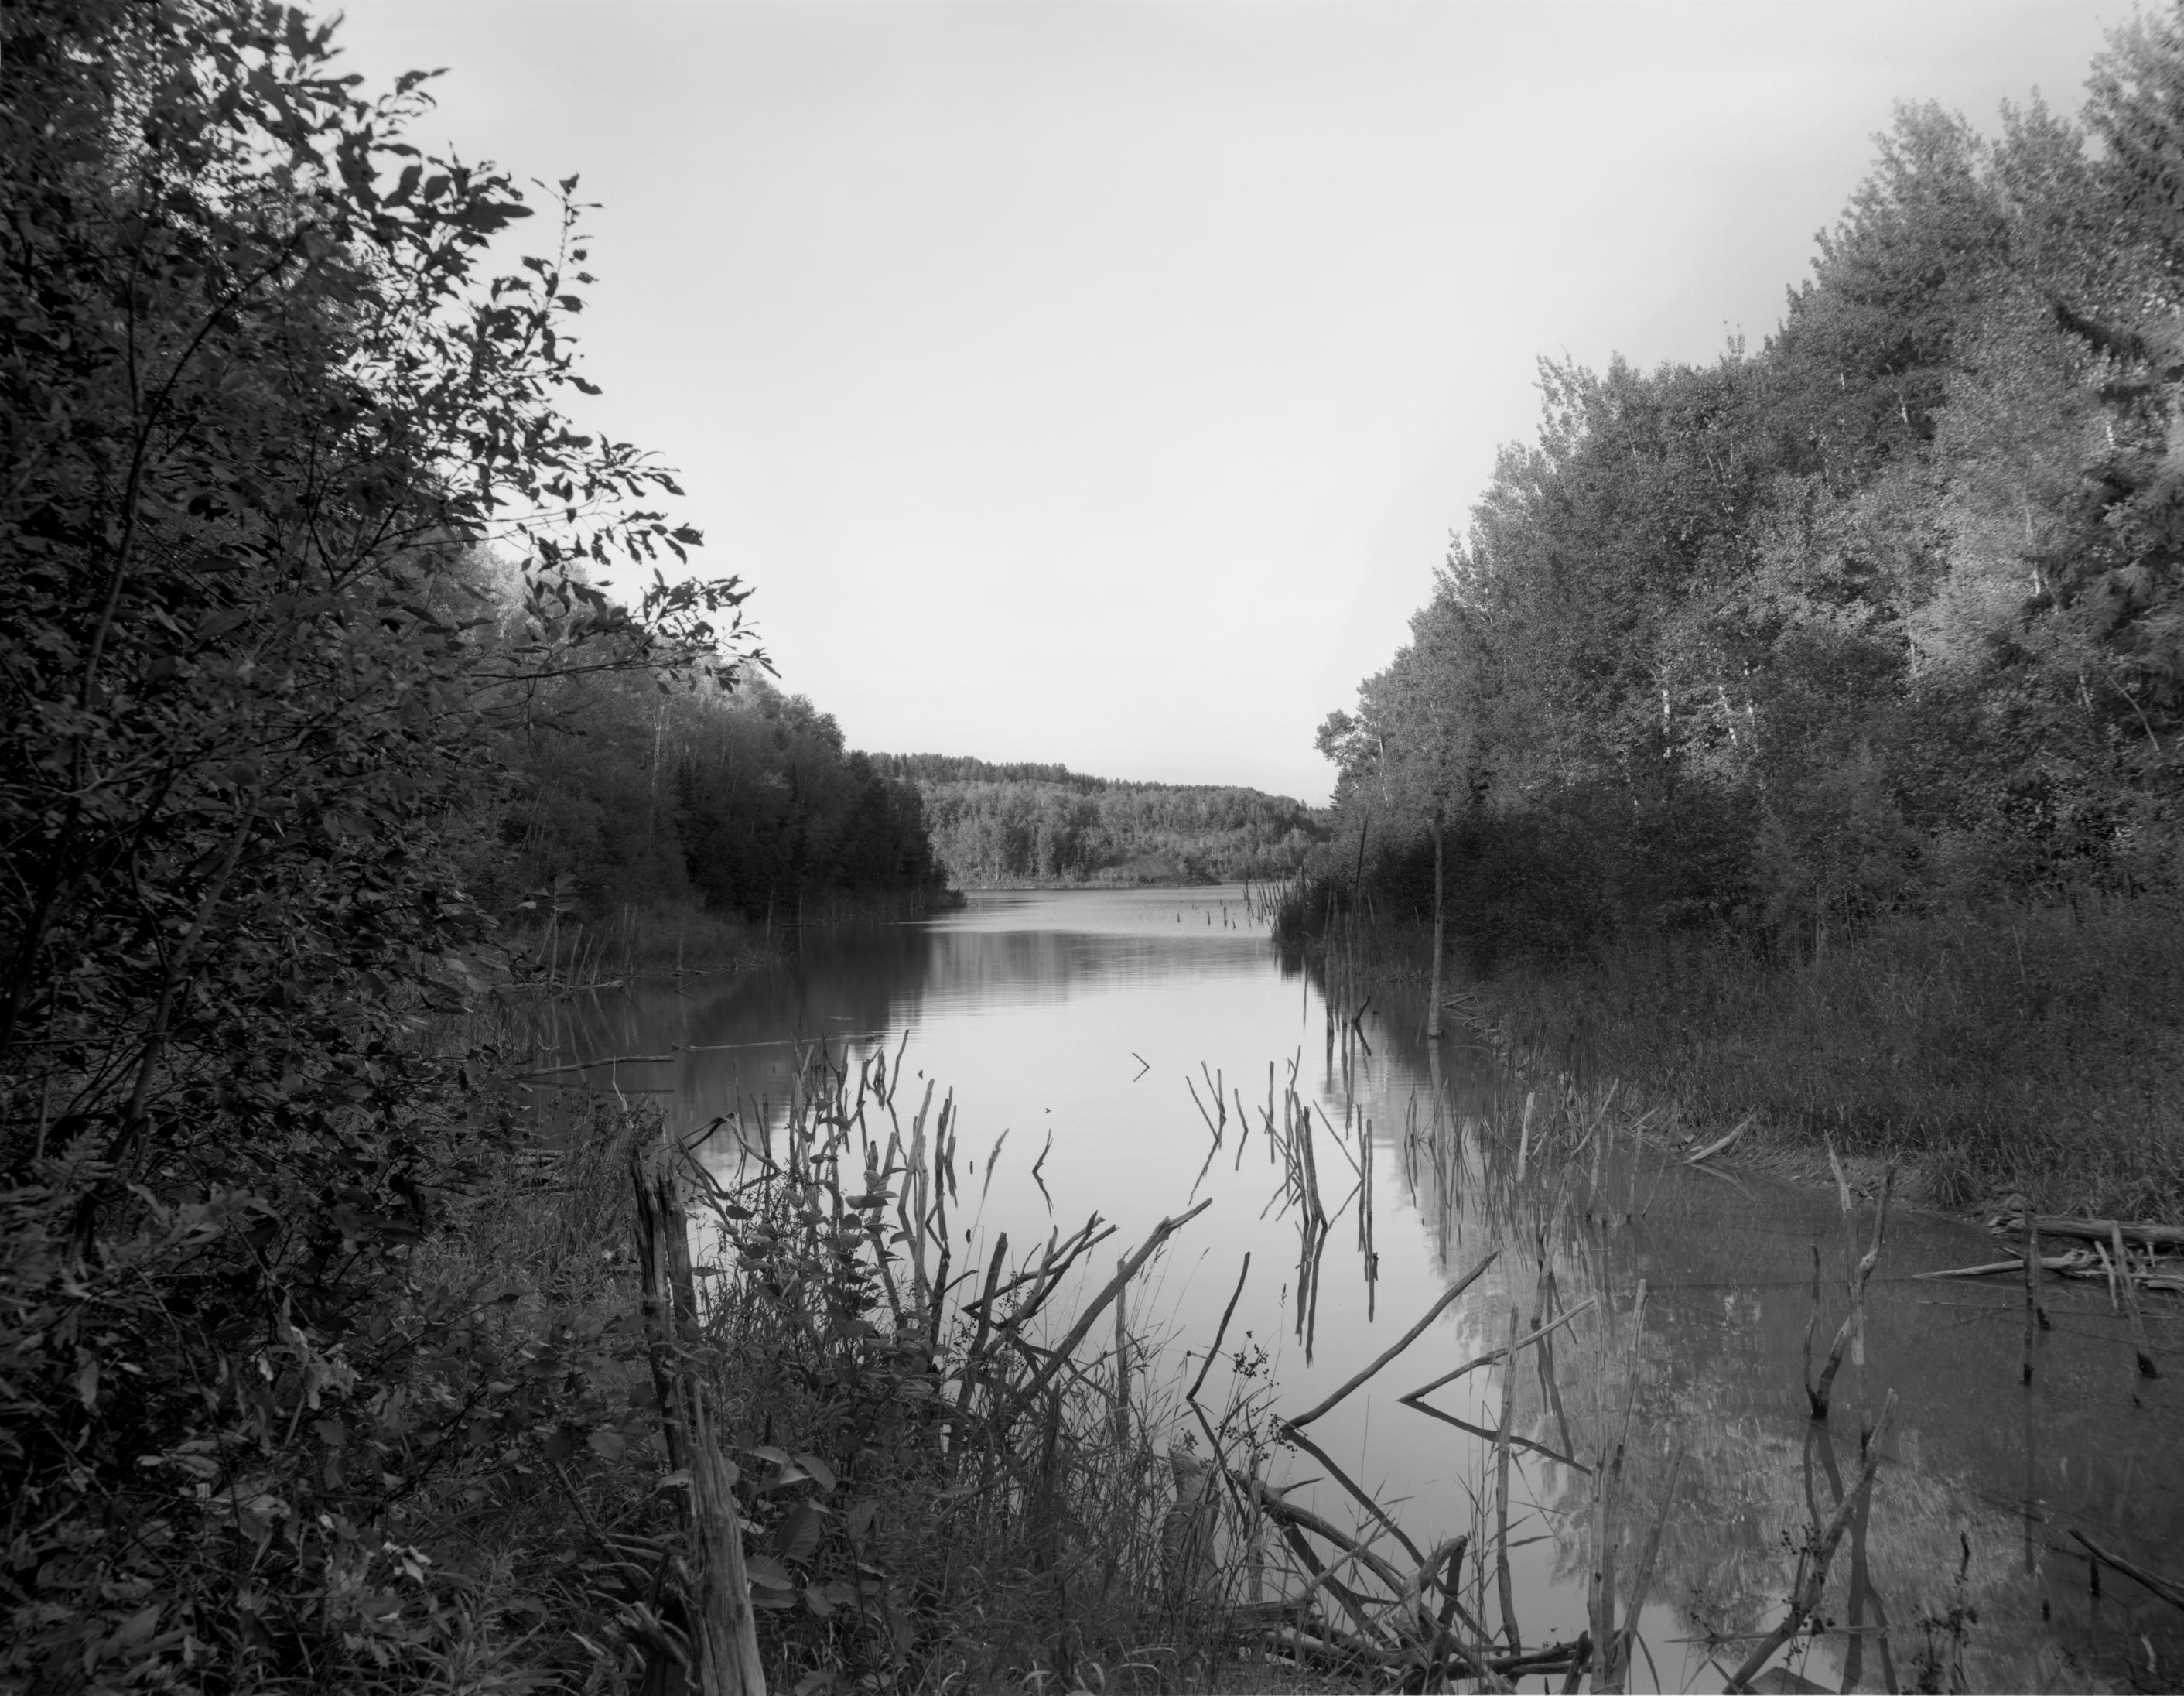 Mountain Iron Mine Landscape - MHPR SL-MIC-030-14